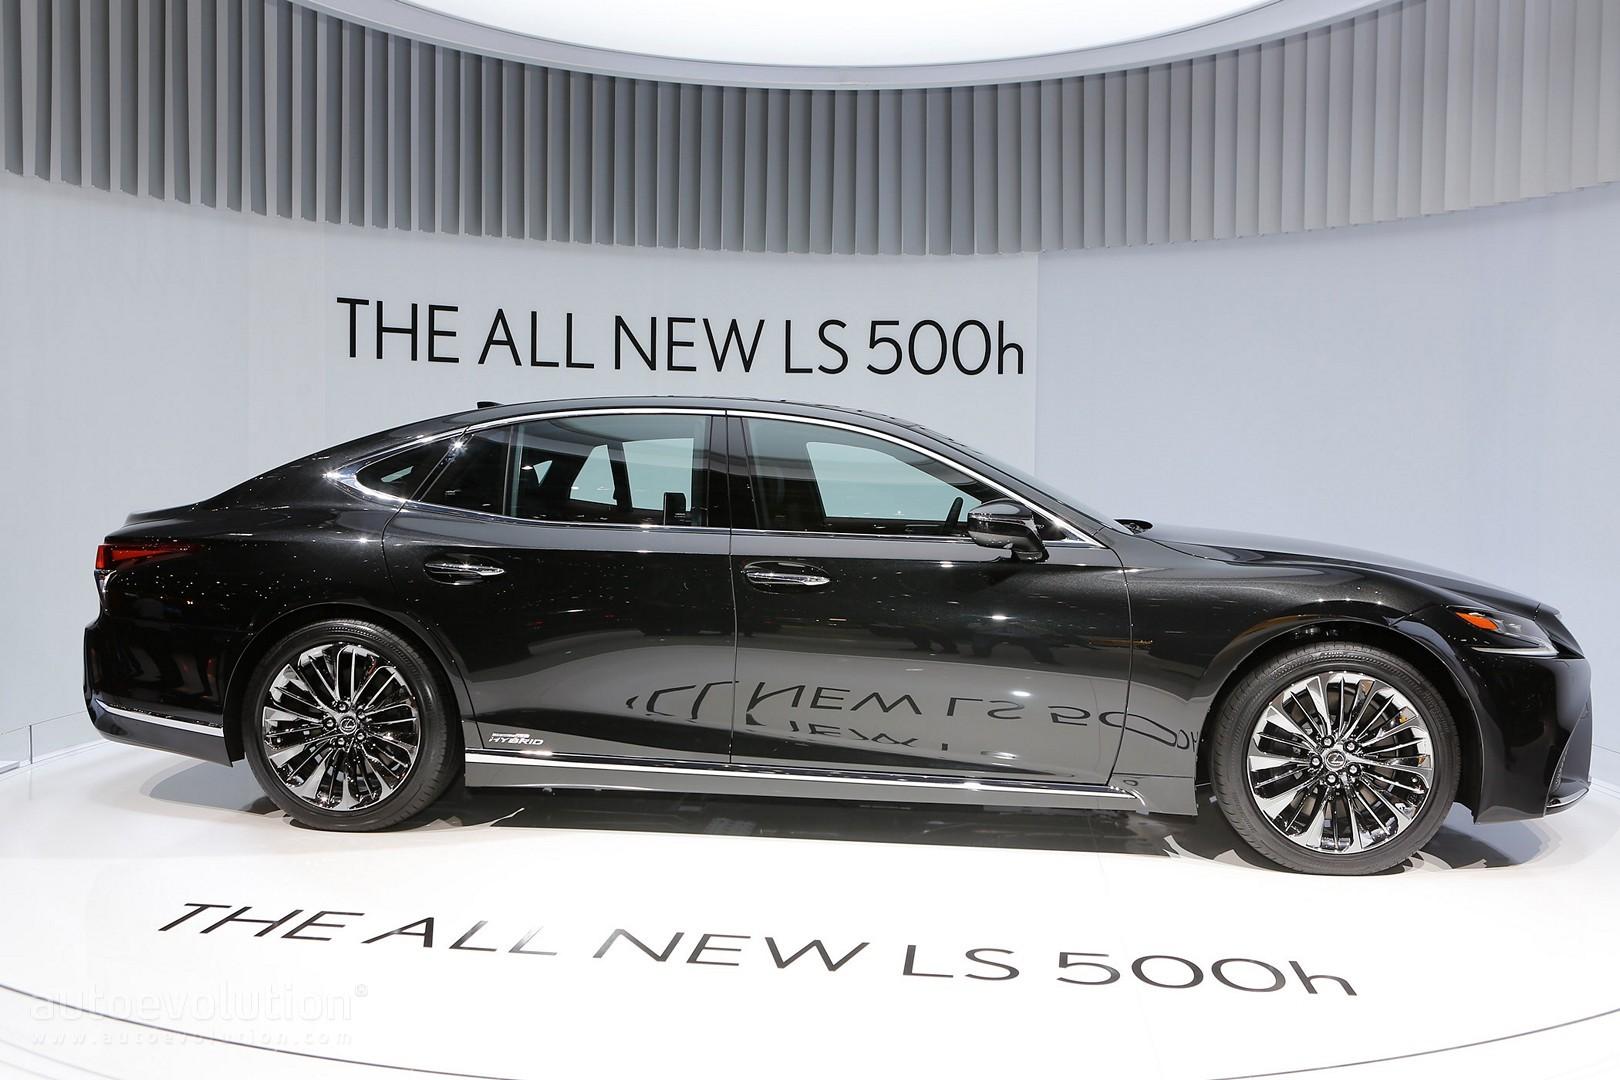 all new vellfire 2018 grand avanza 2016 tipe g the lexus ls 500h gets revealed in geneva